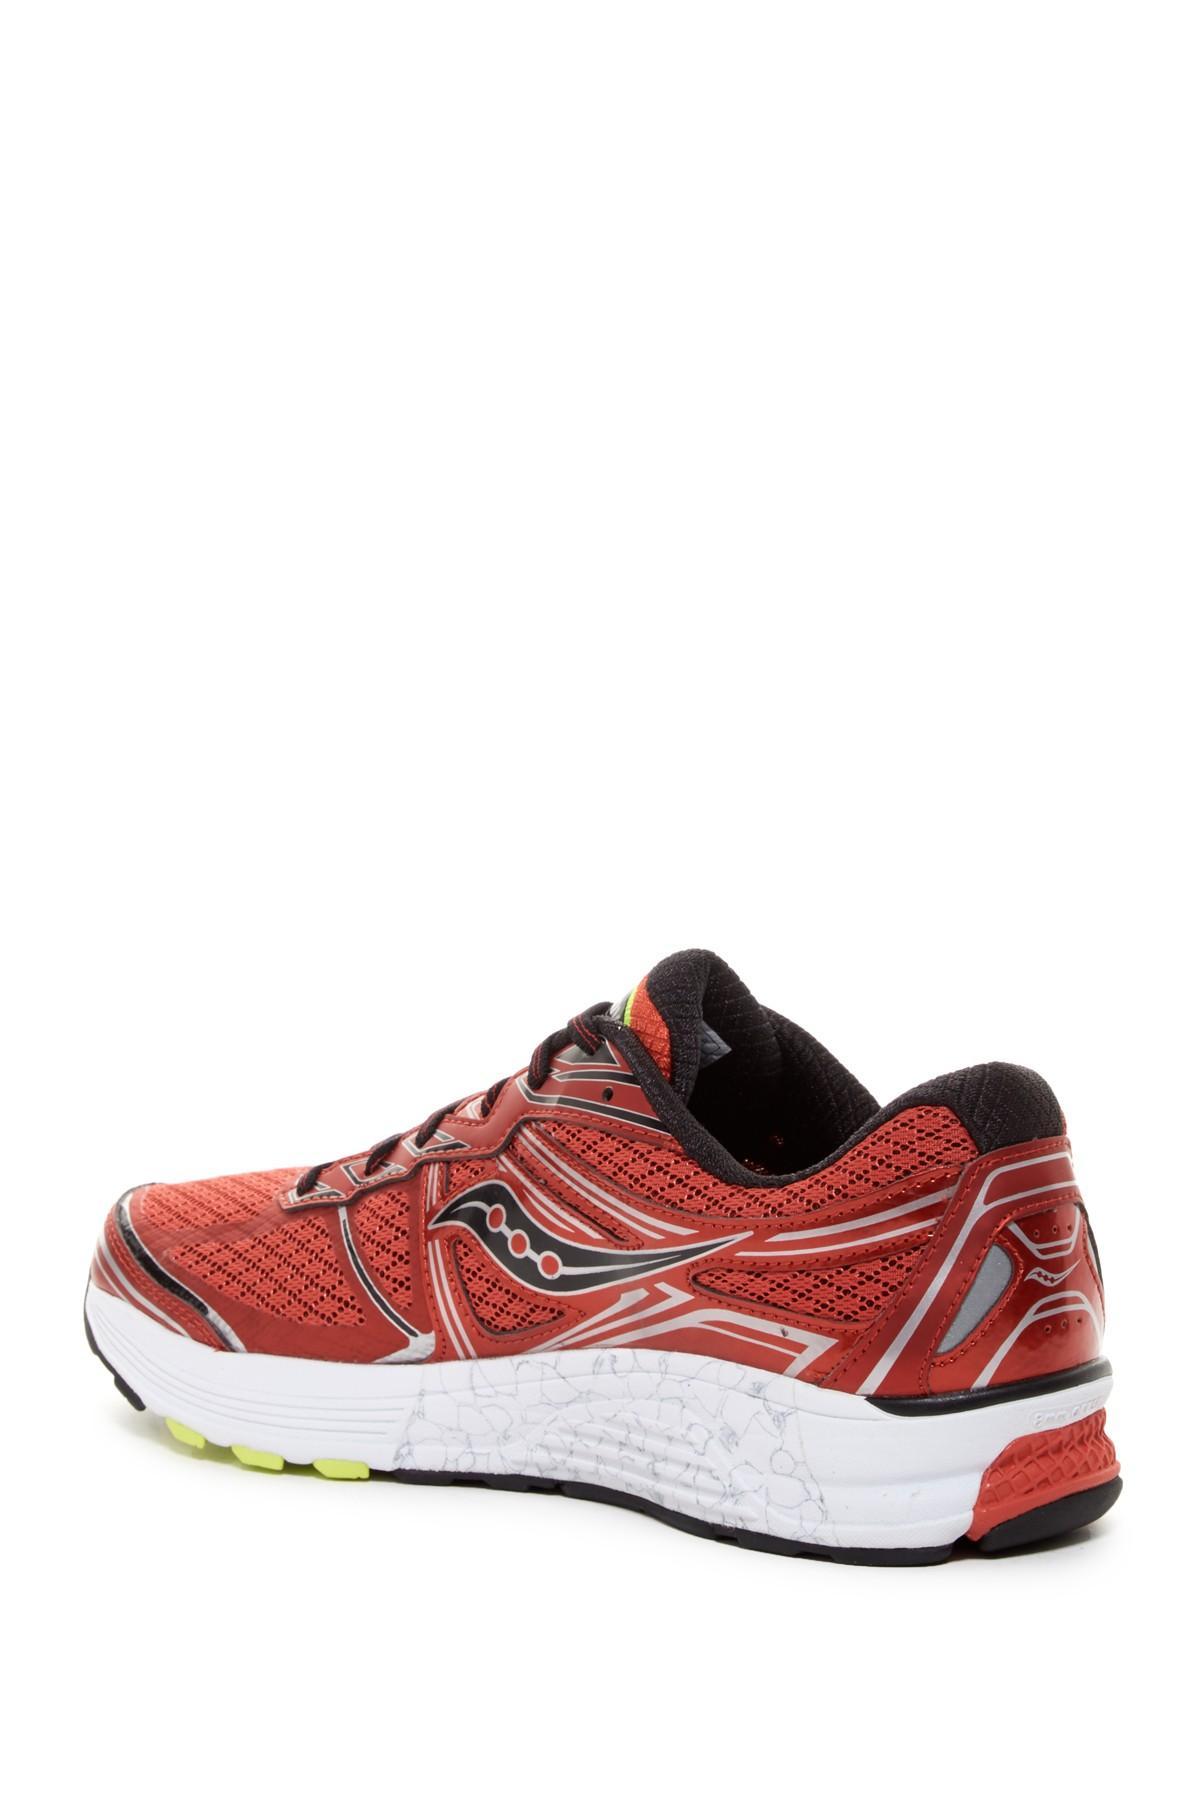 Adidas Men S Speed Trainer  Running Shoes Zappos